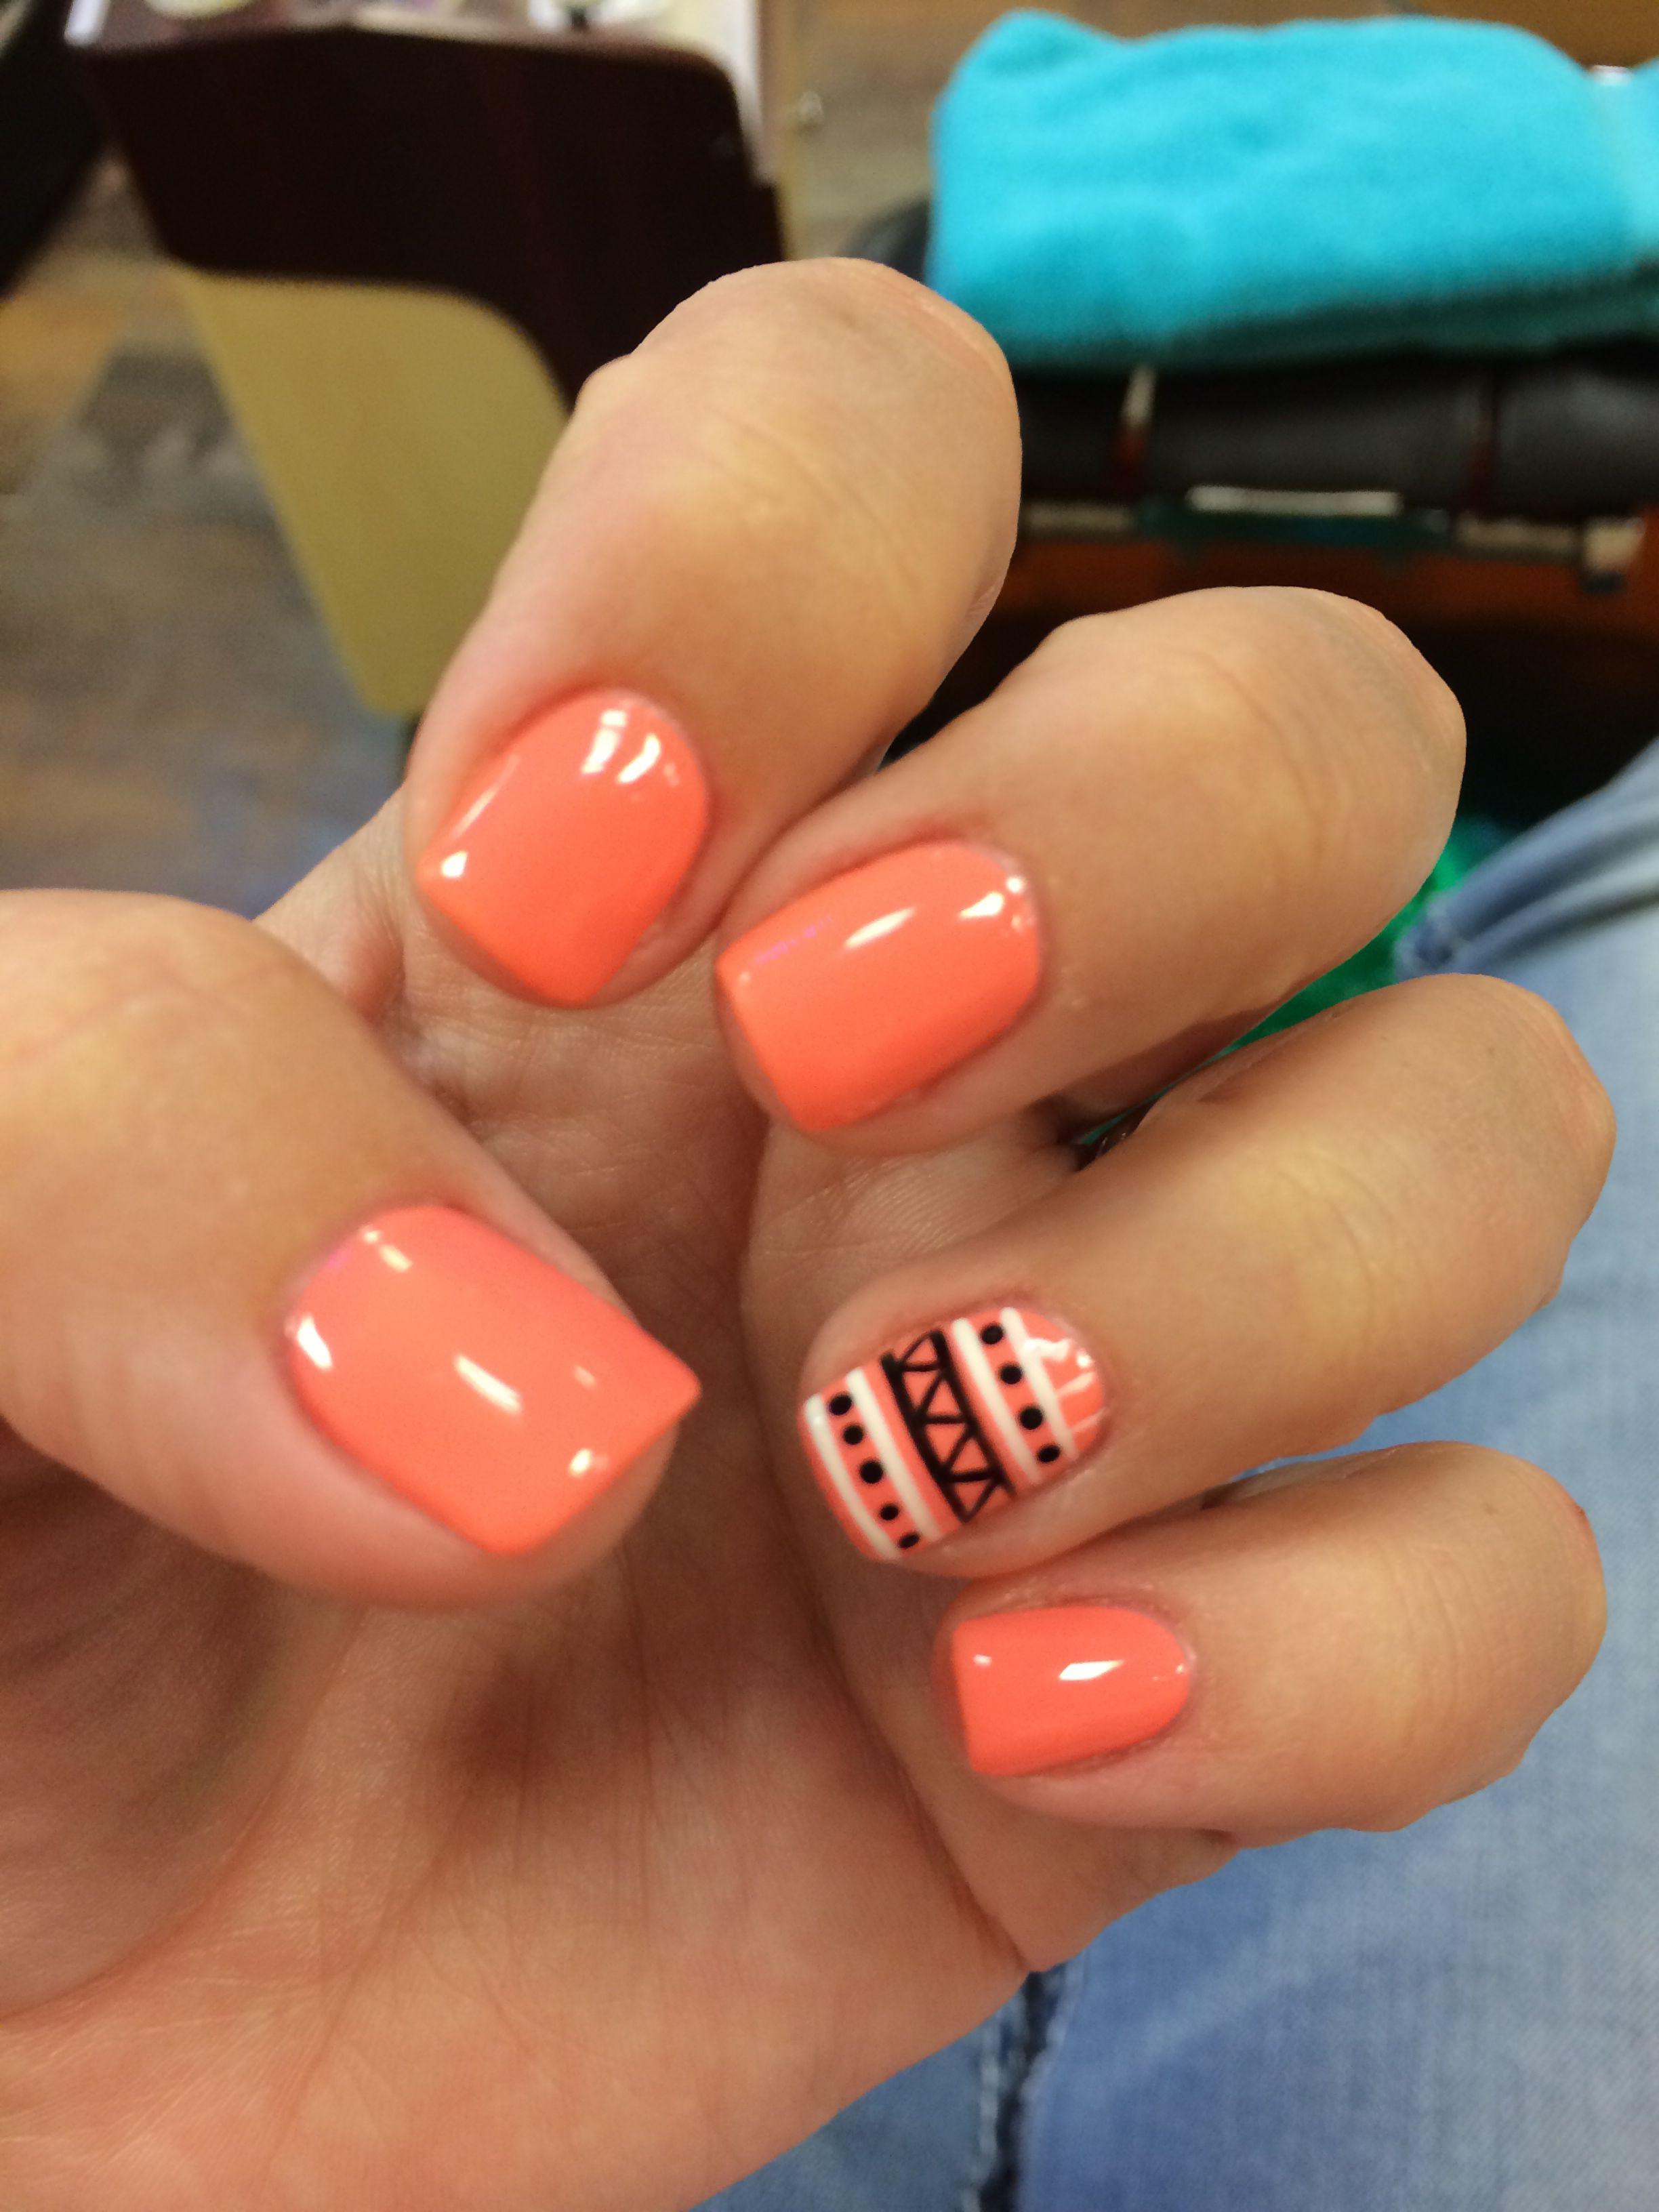 Aztech Nails Nail Art Nail Design Manicure Shellac Gel Dem